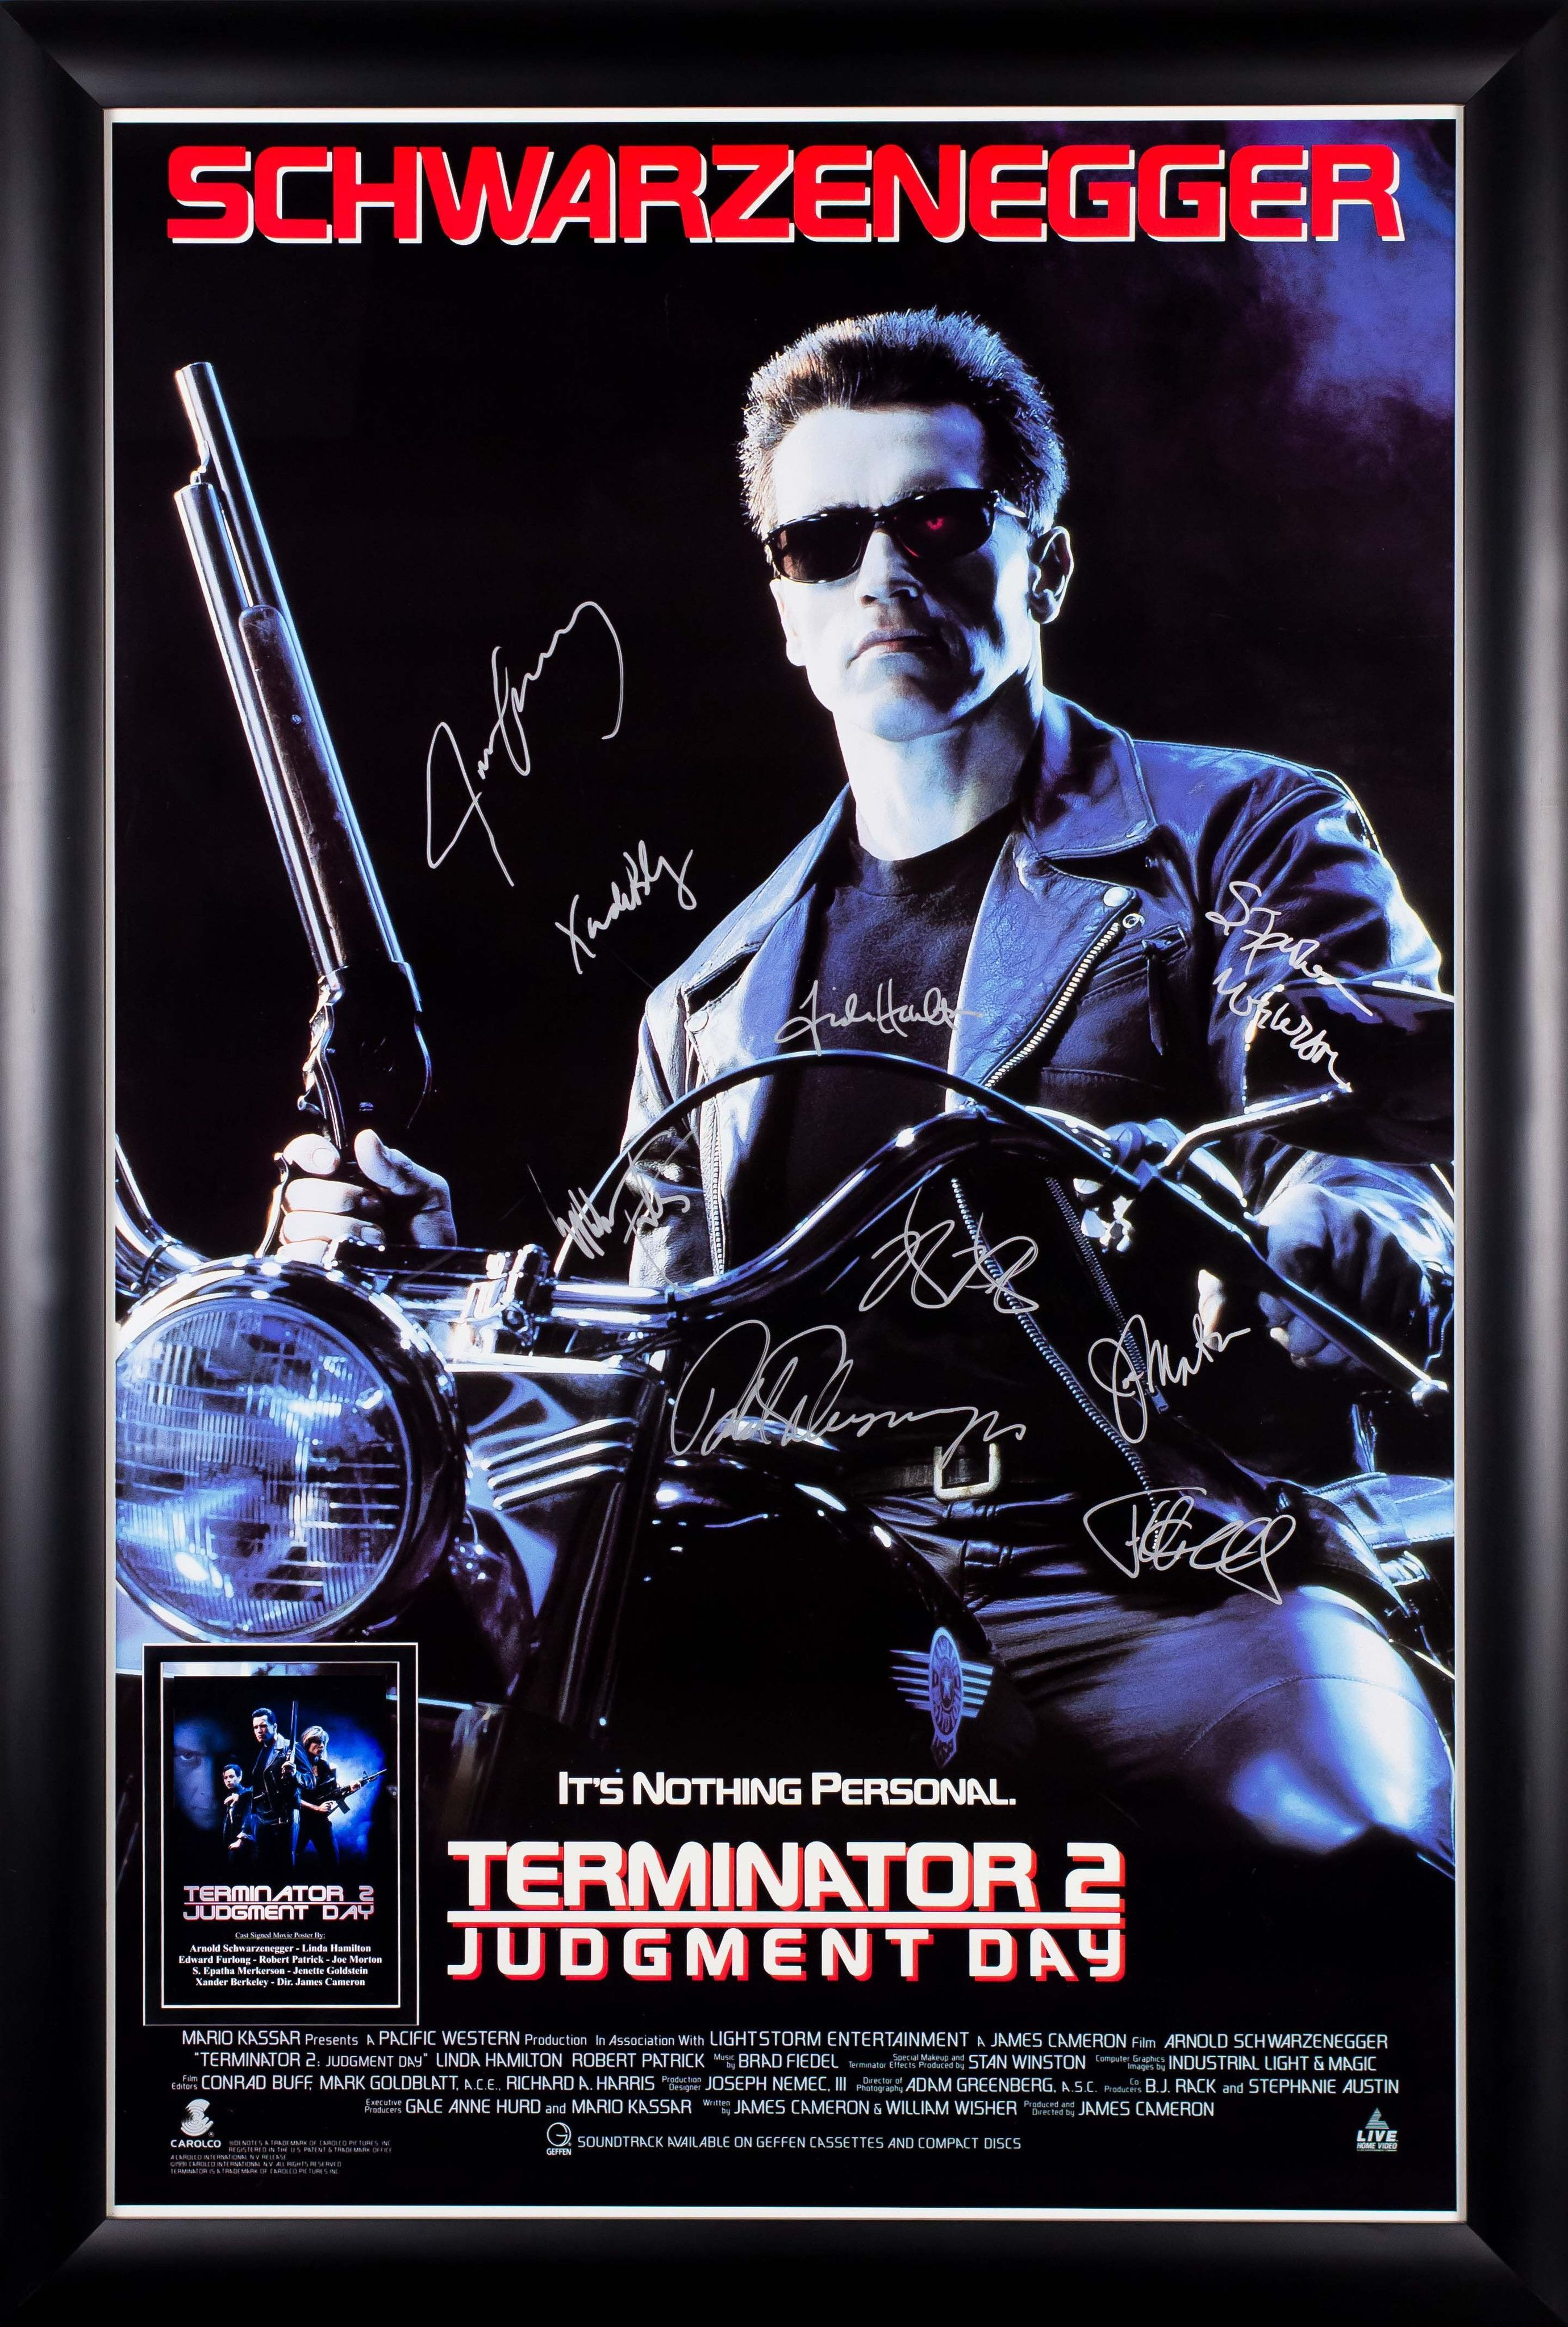 The Terminator 2 Judgement Day 1991 Movie Poster 23 x 35